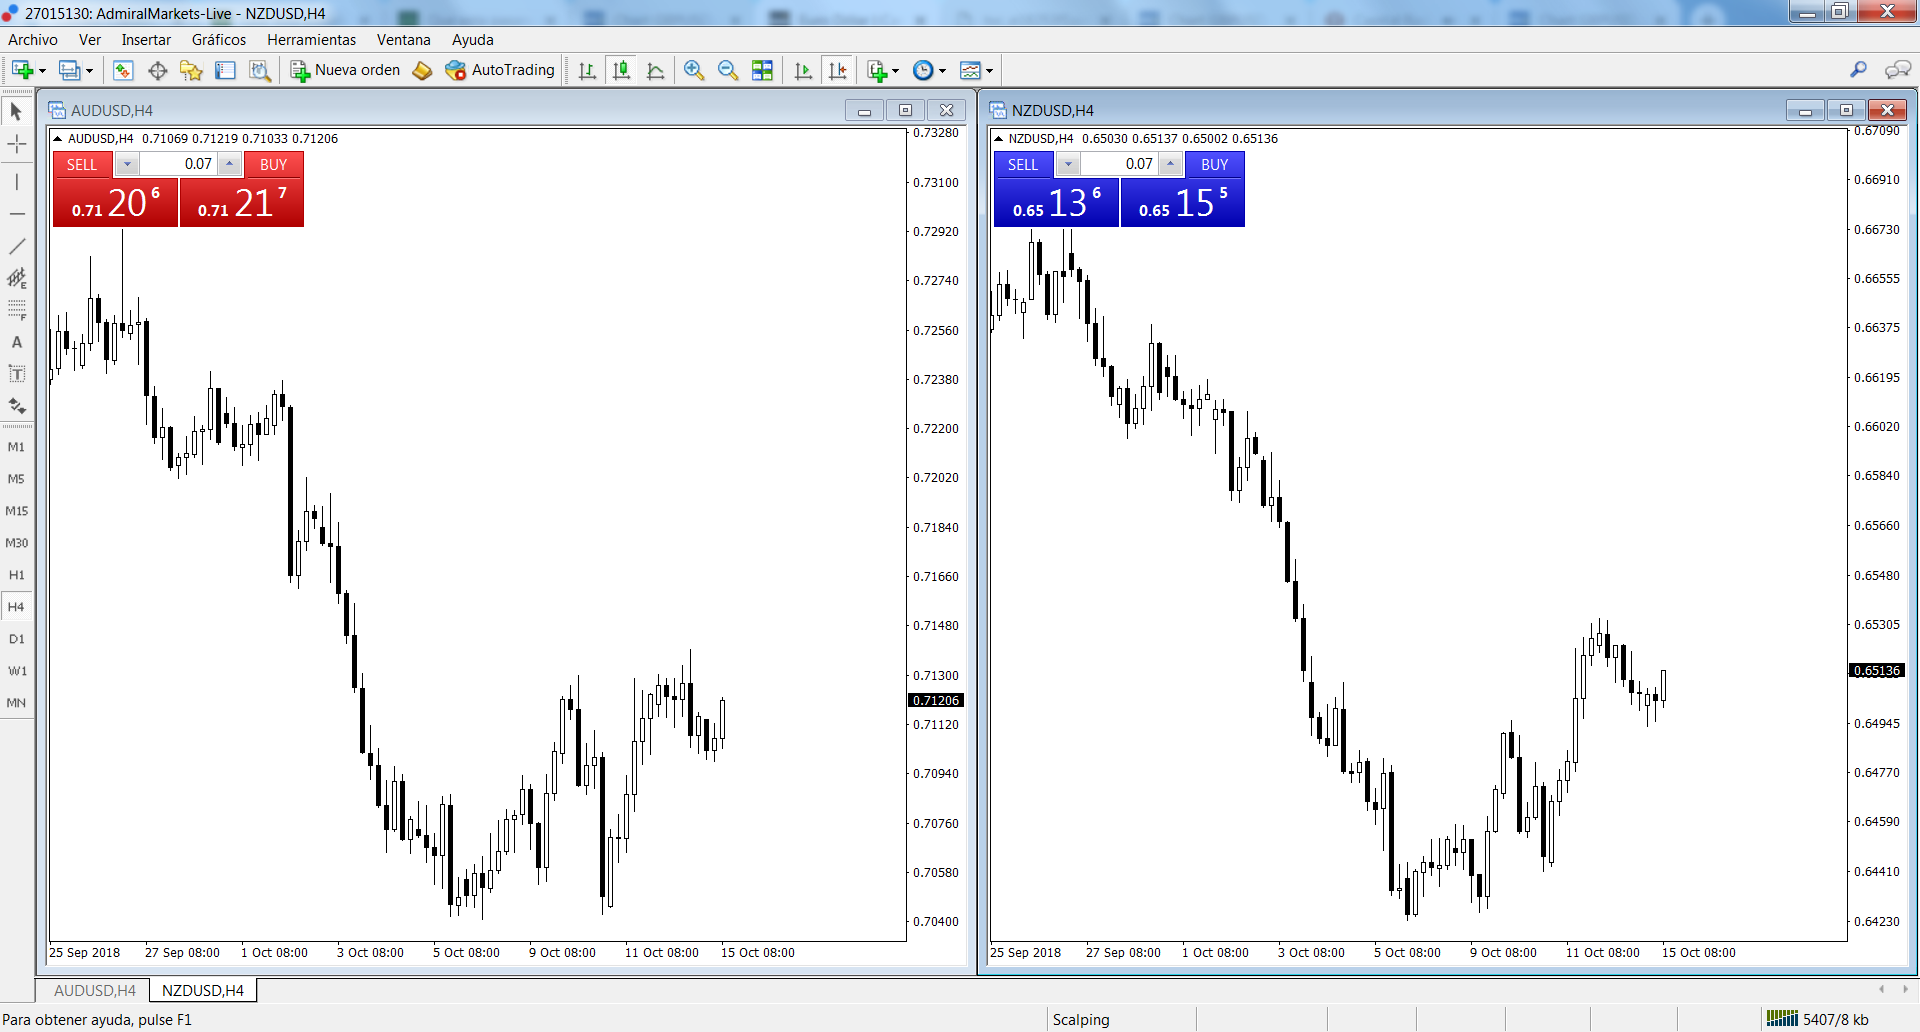 3830_metatrader_4_admiral_markets.png